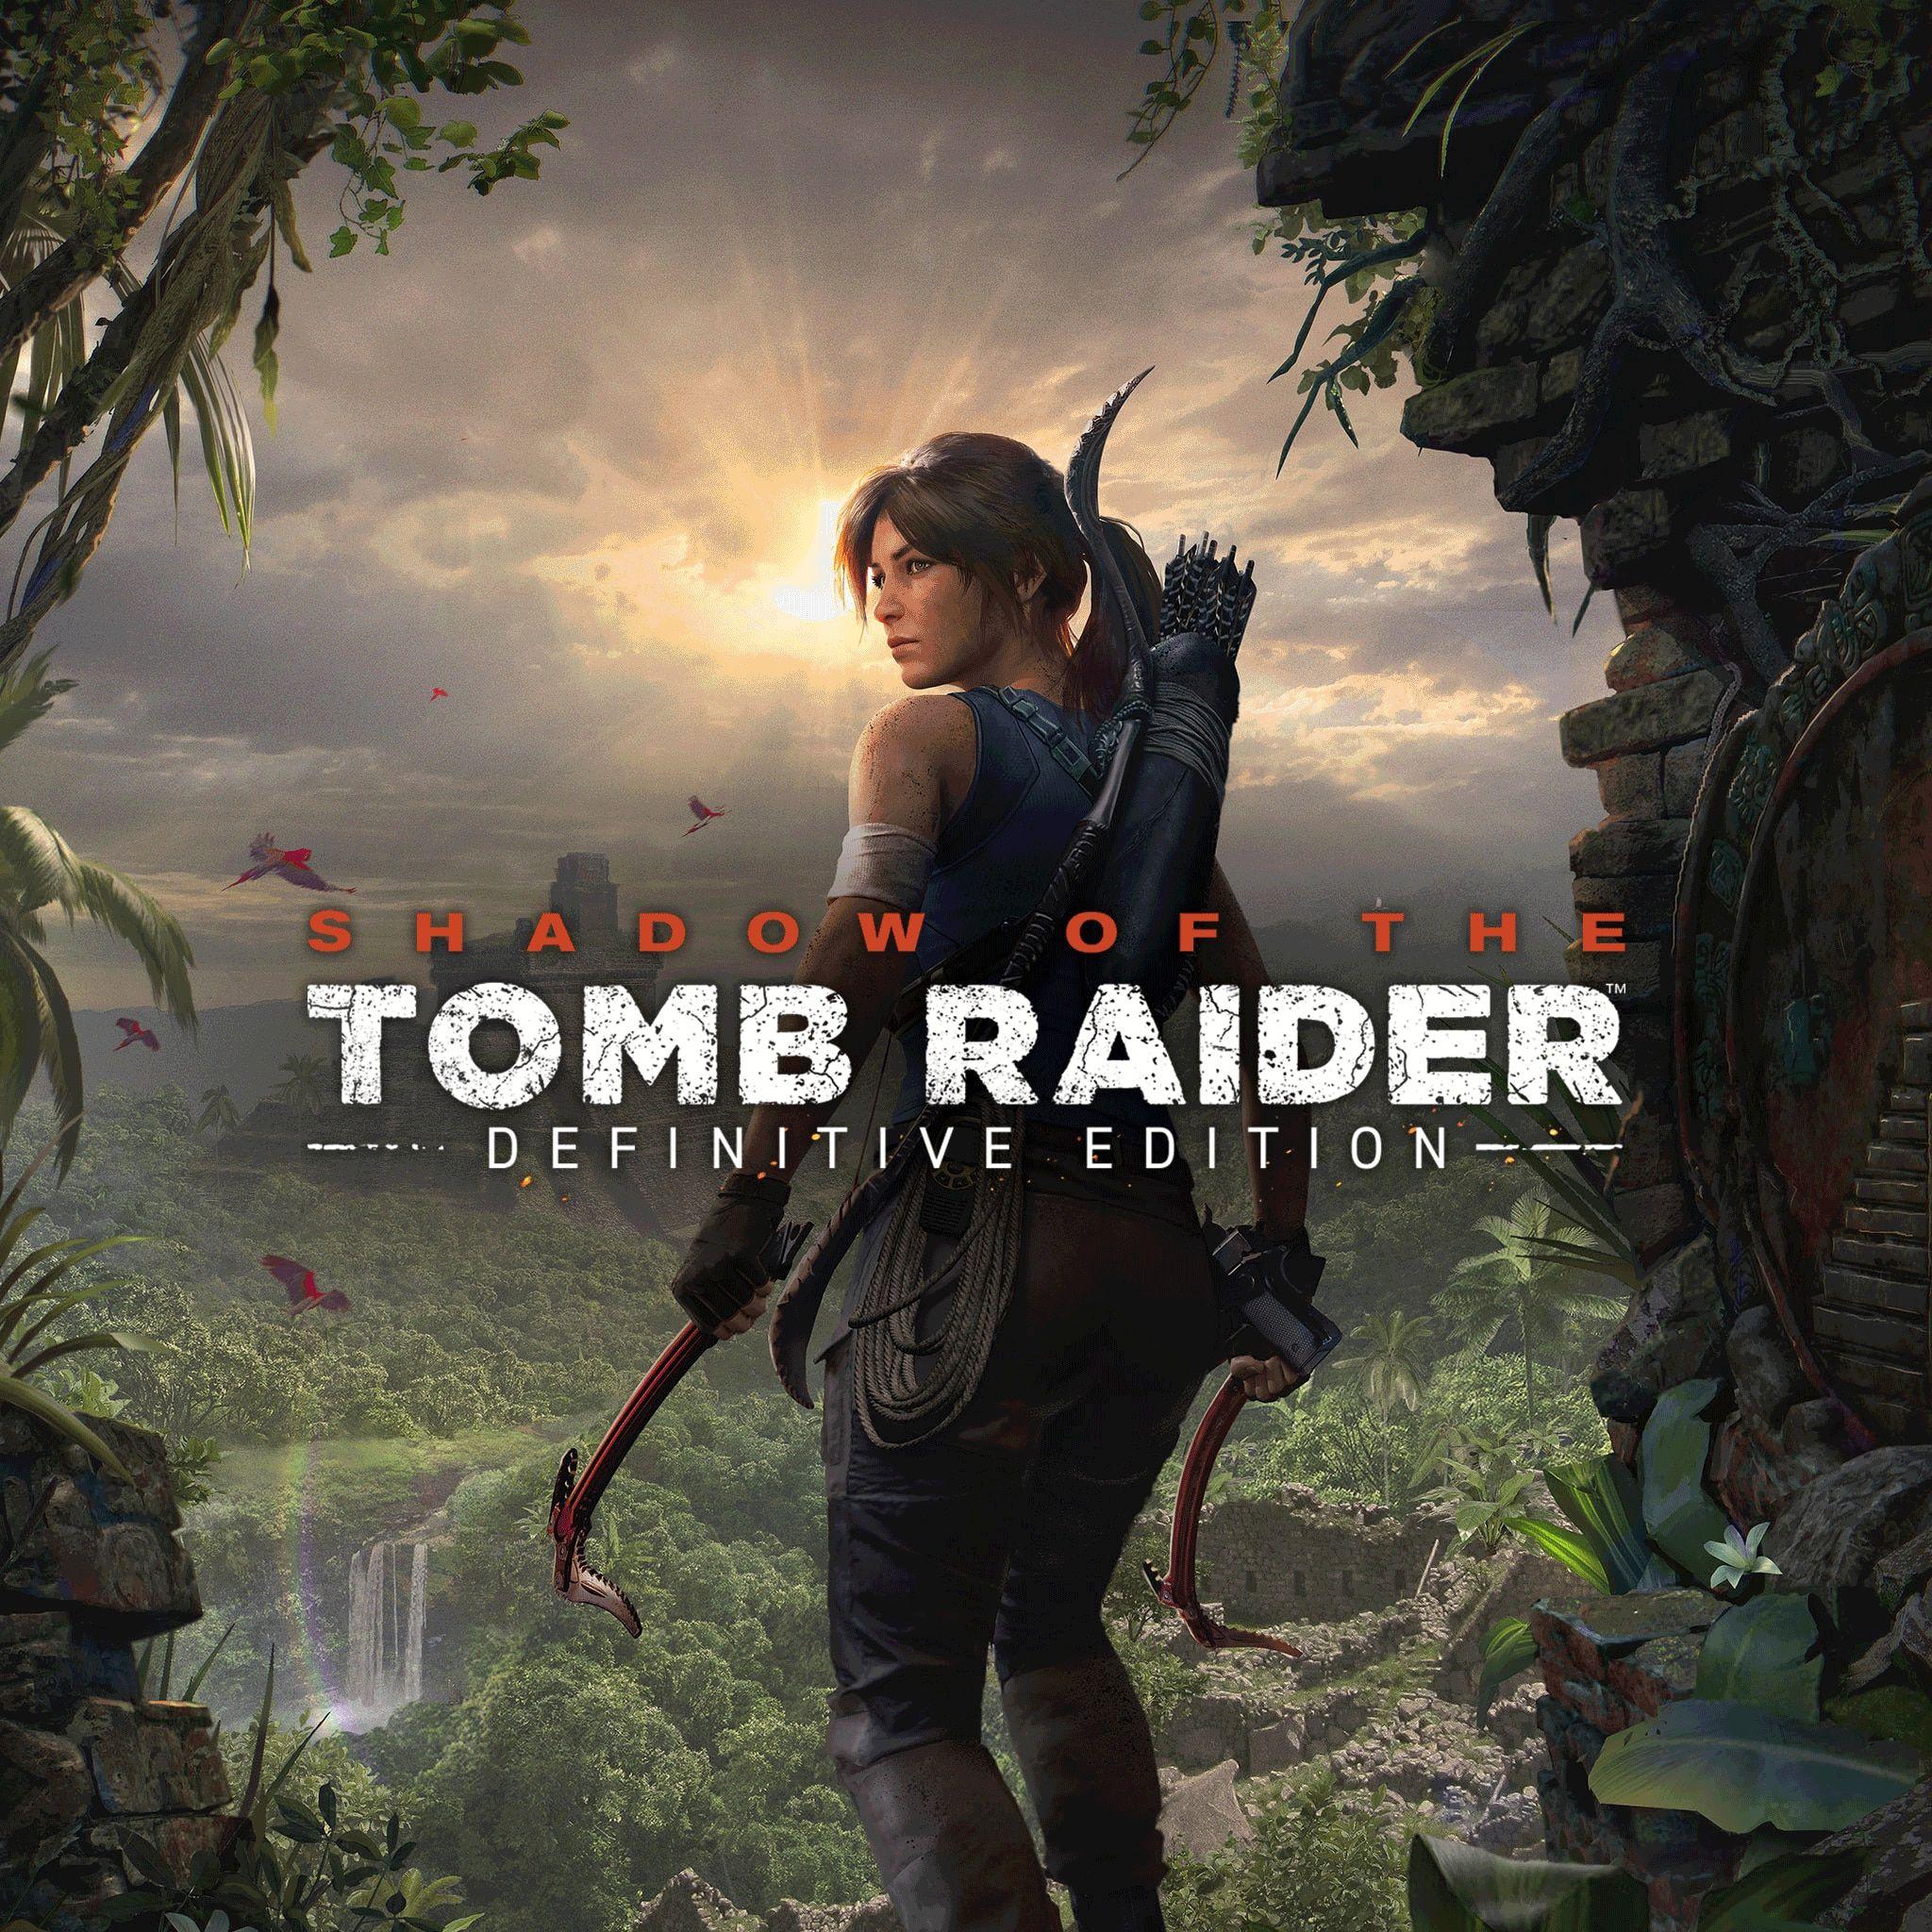 Shadow of the Tomb Raider - Definitive Edition £11.34 via Shopto.net PSN credit + £2.49